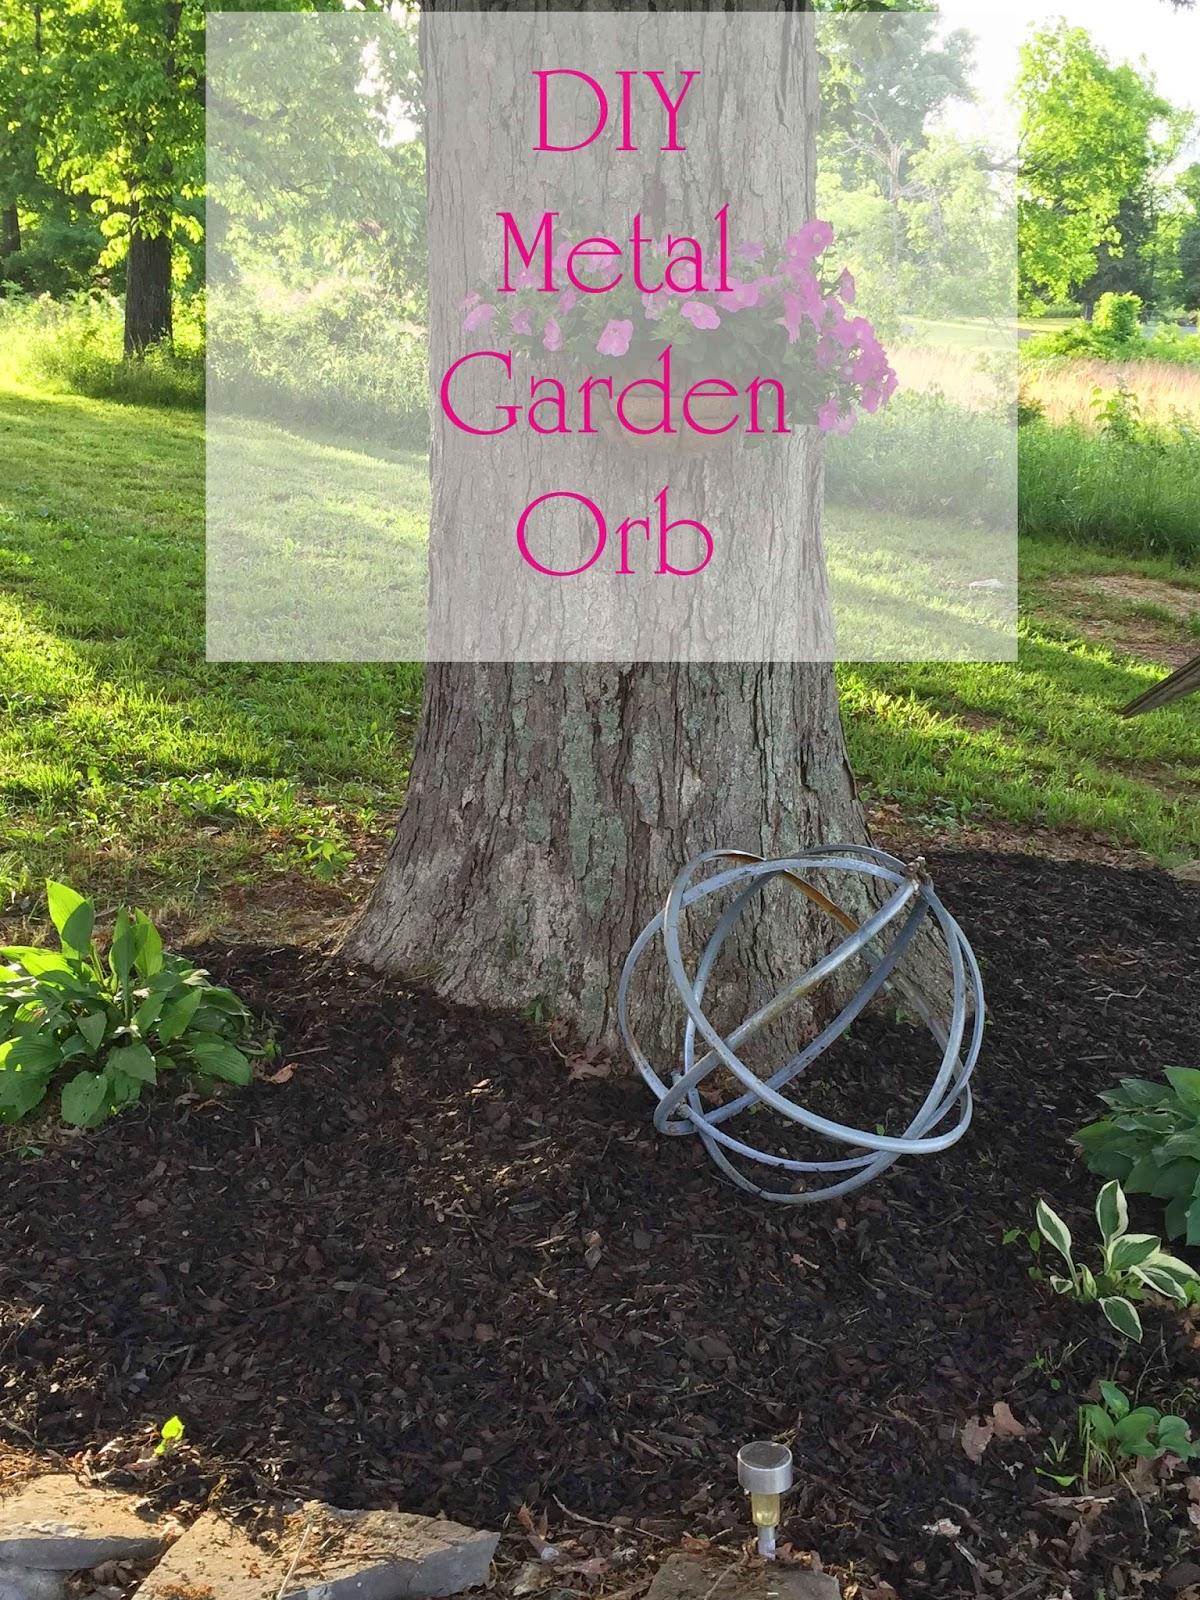 Repurpose Steel Drum Rings Into Garden Orbs